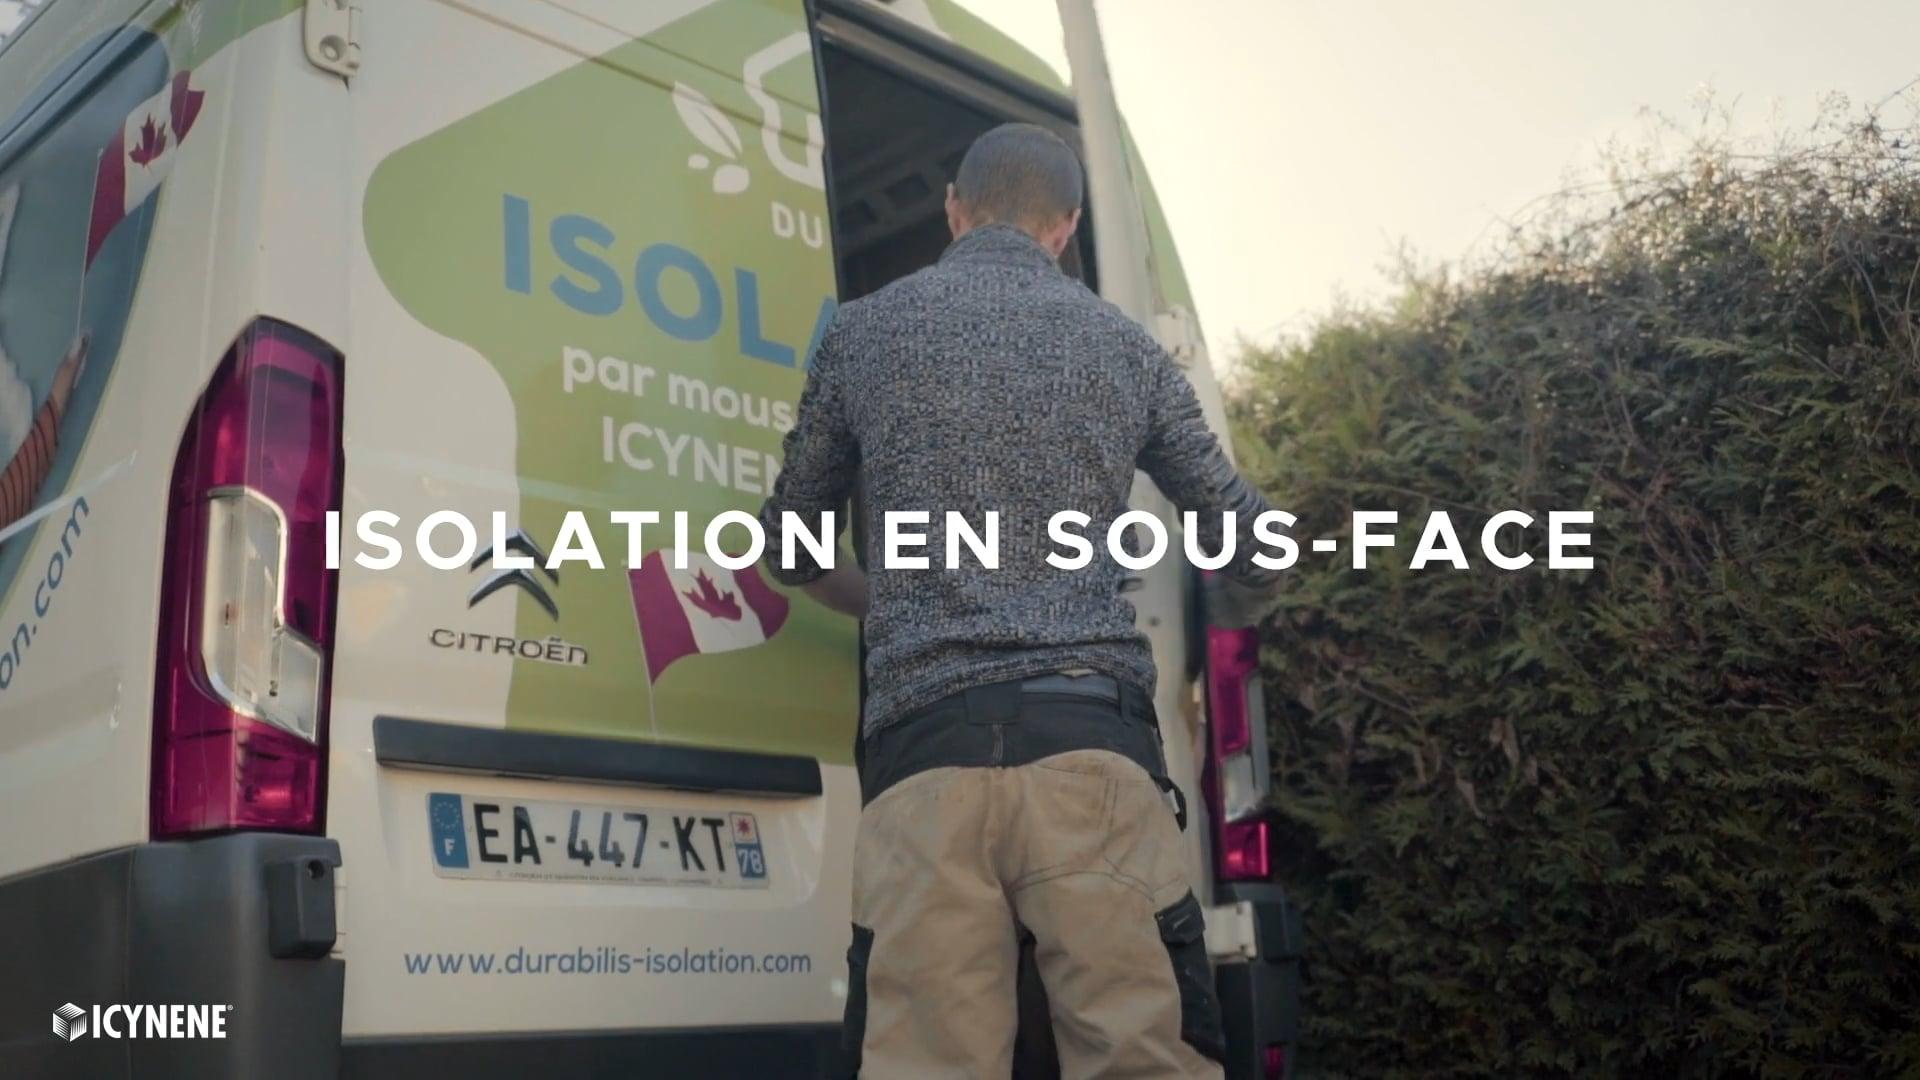 Isolation en sous-face | Icynene